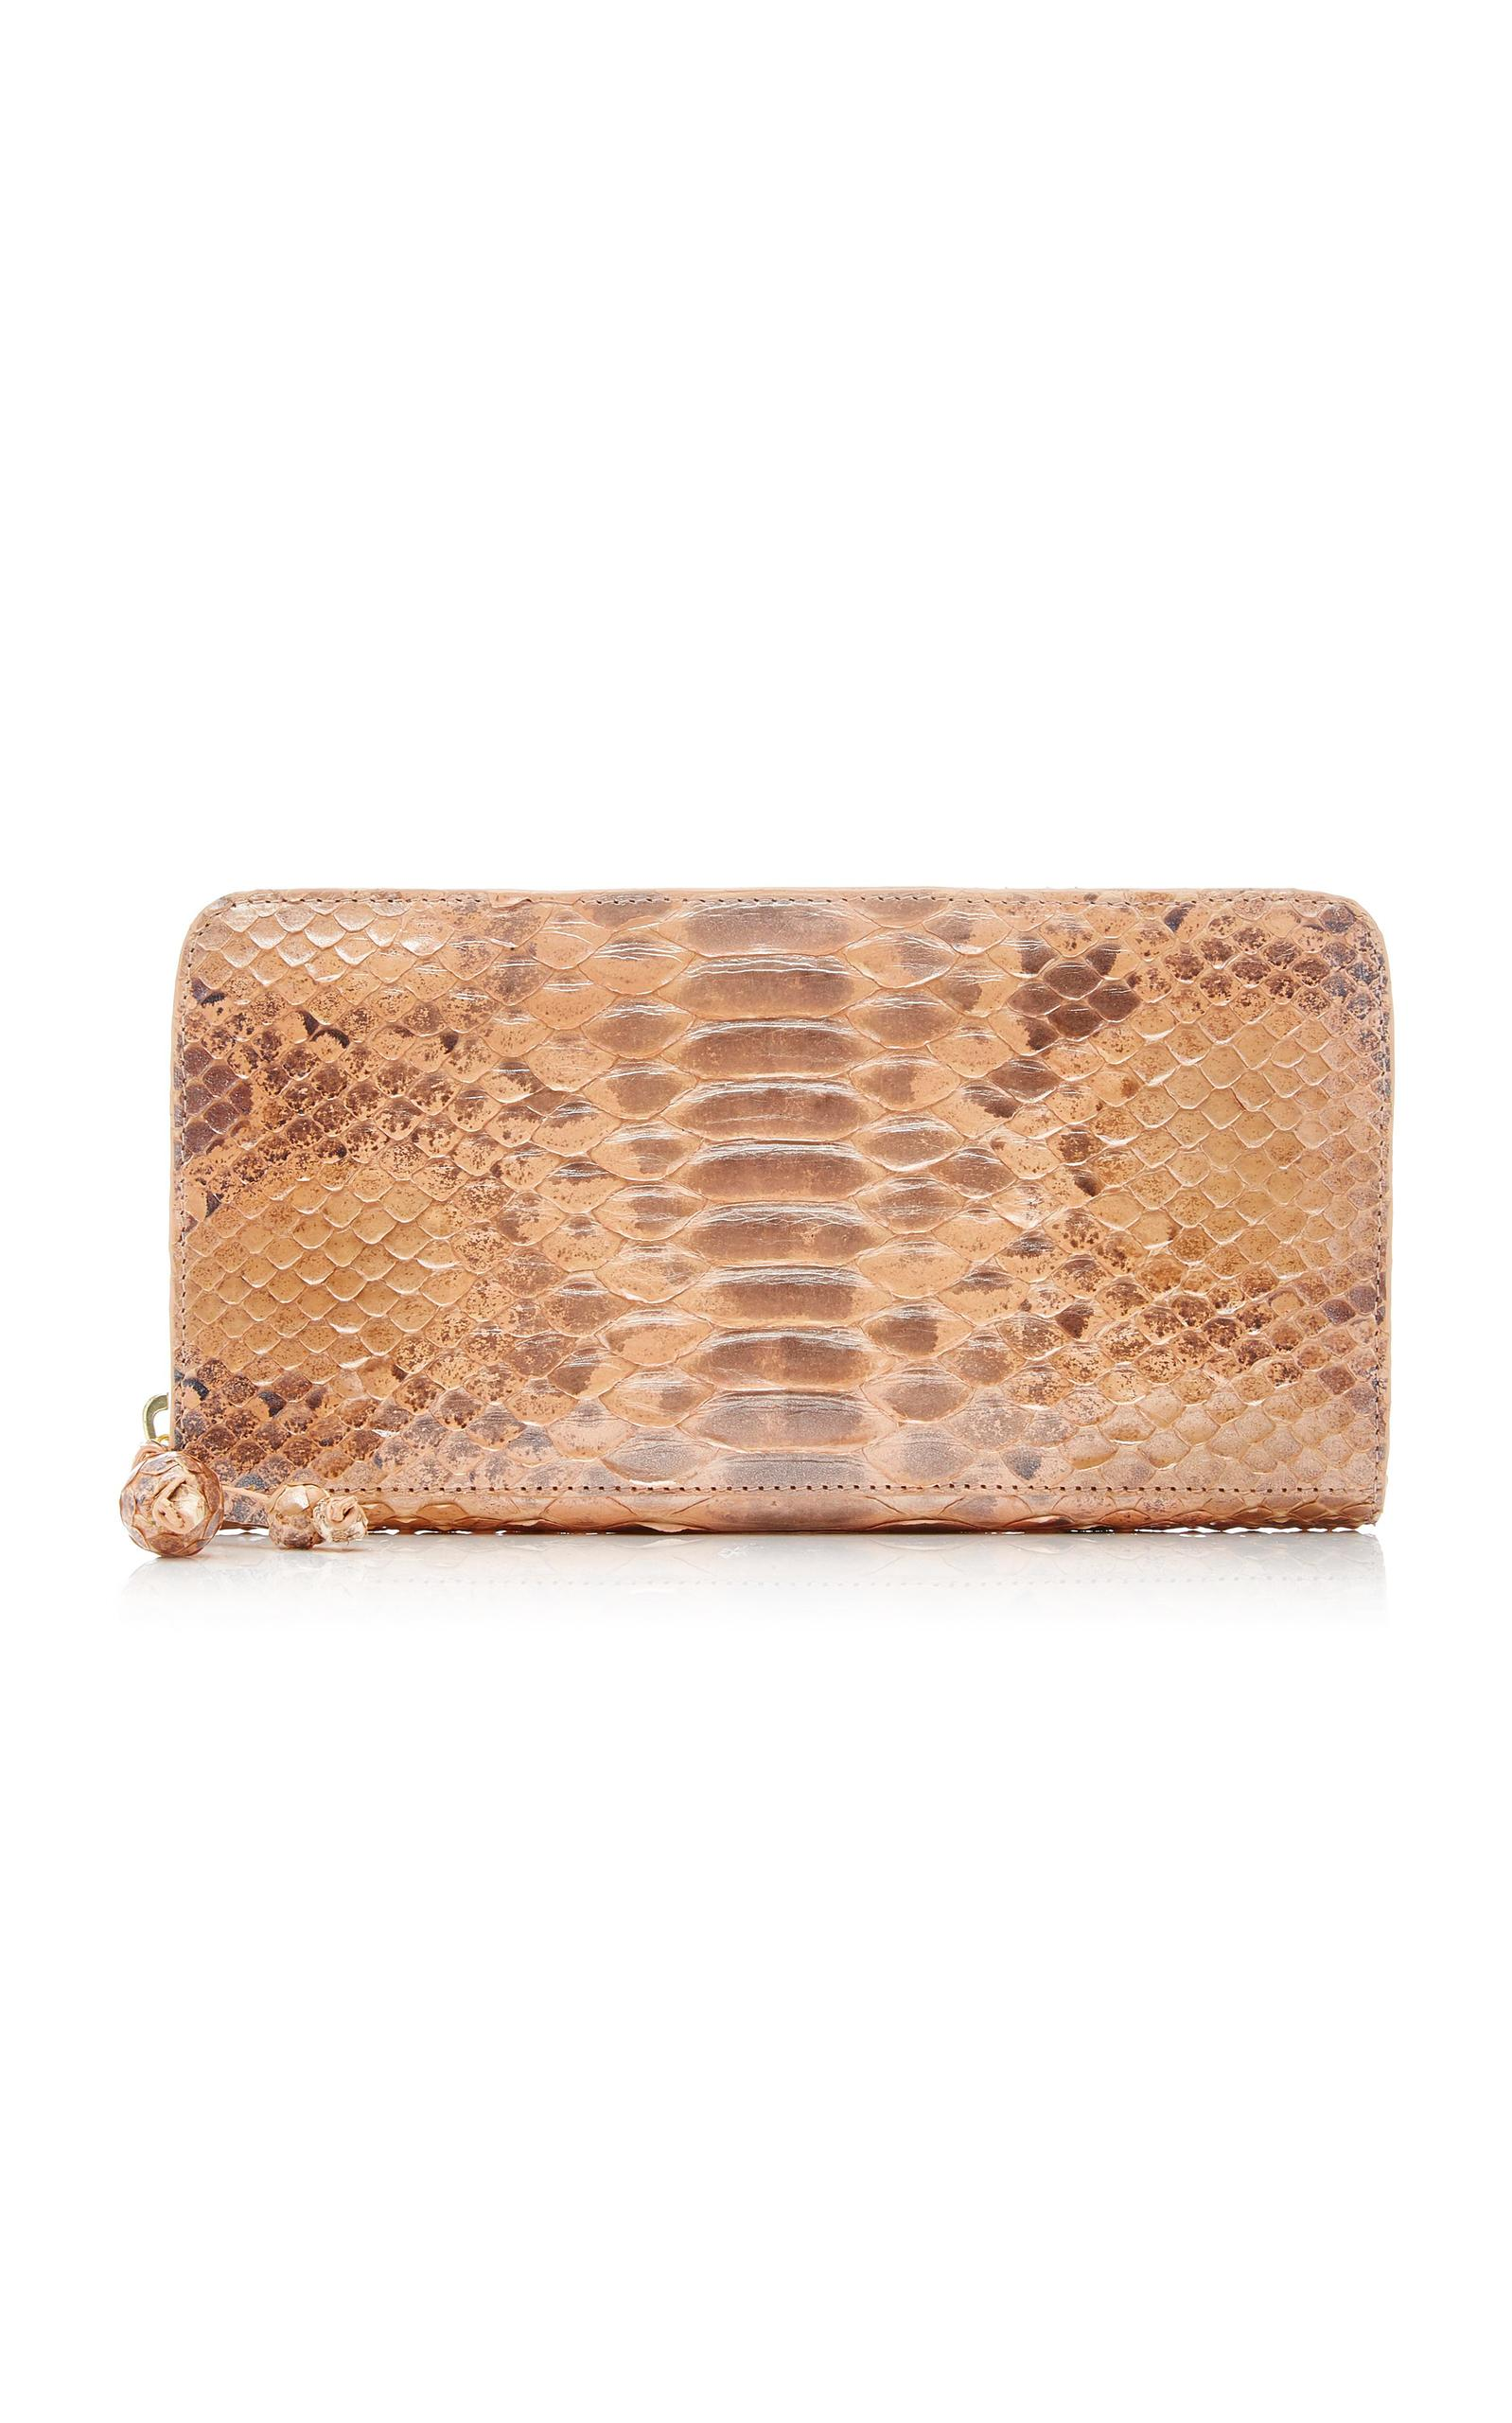 Nancy Gonzalez M'O Exclusive Wallet In Neutral